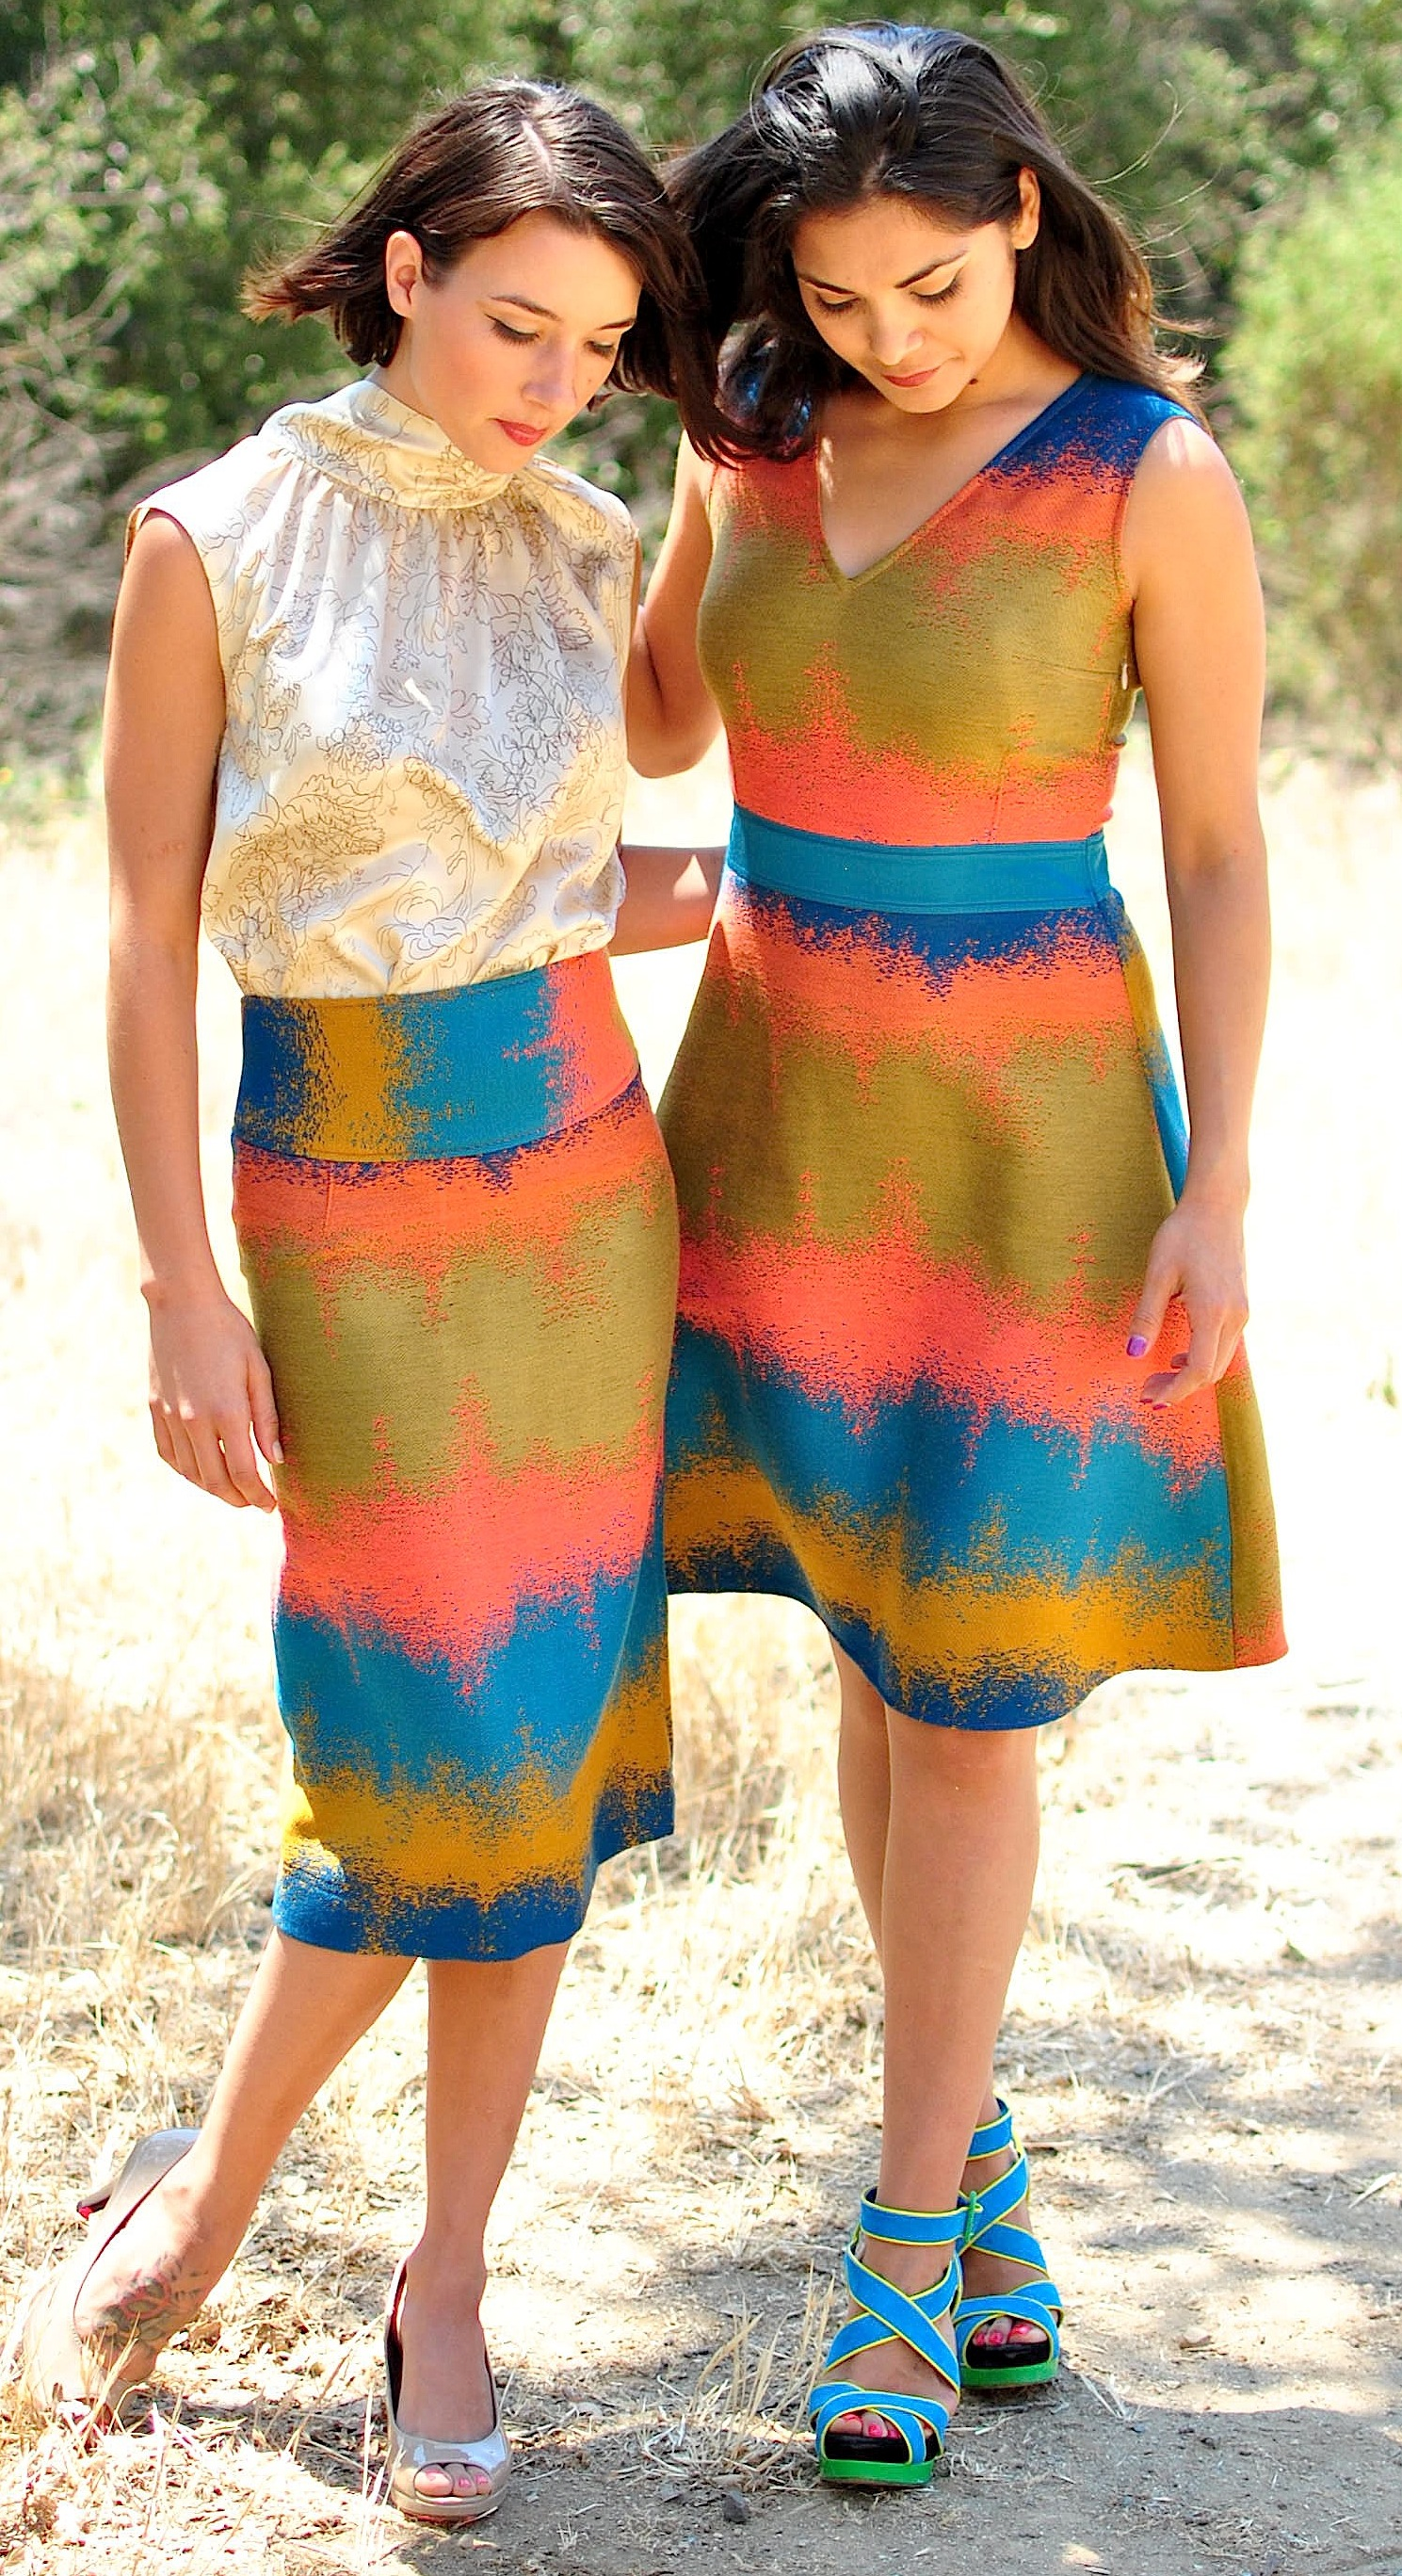 #386B High-Neck Sheath Blouse  in Antique Floral Silk Charmeuse  #373 High-Waisted Pencil Skirt in Couture Jacquard  #277B V-Neck Swing-Dress in   Couture Jacquard w/ Satin Waist